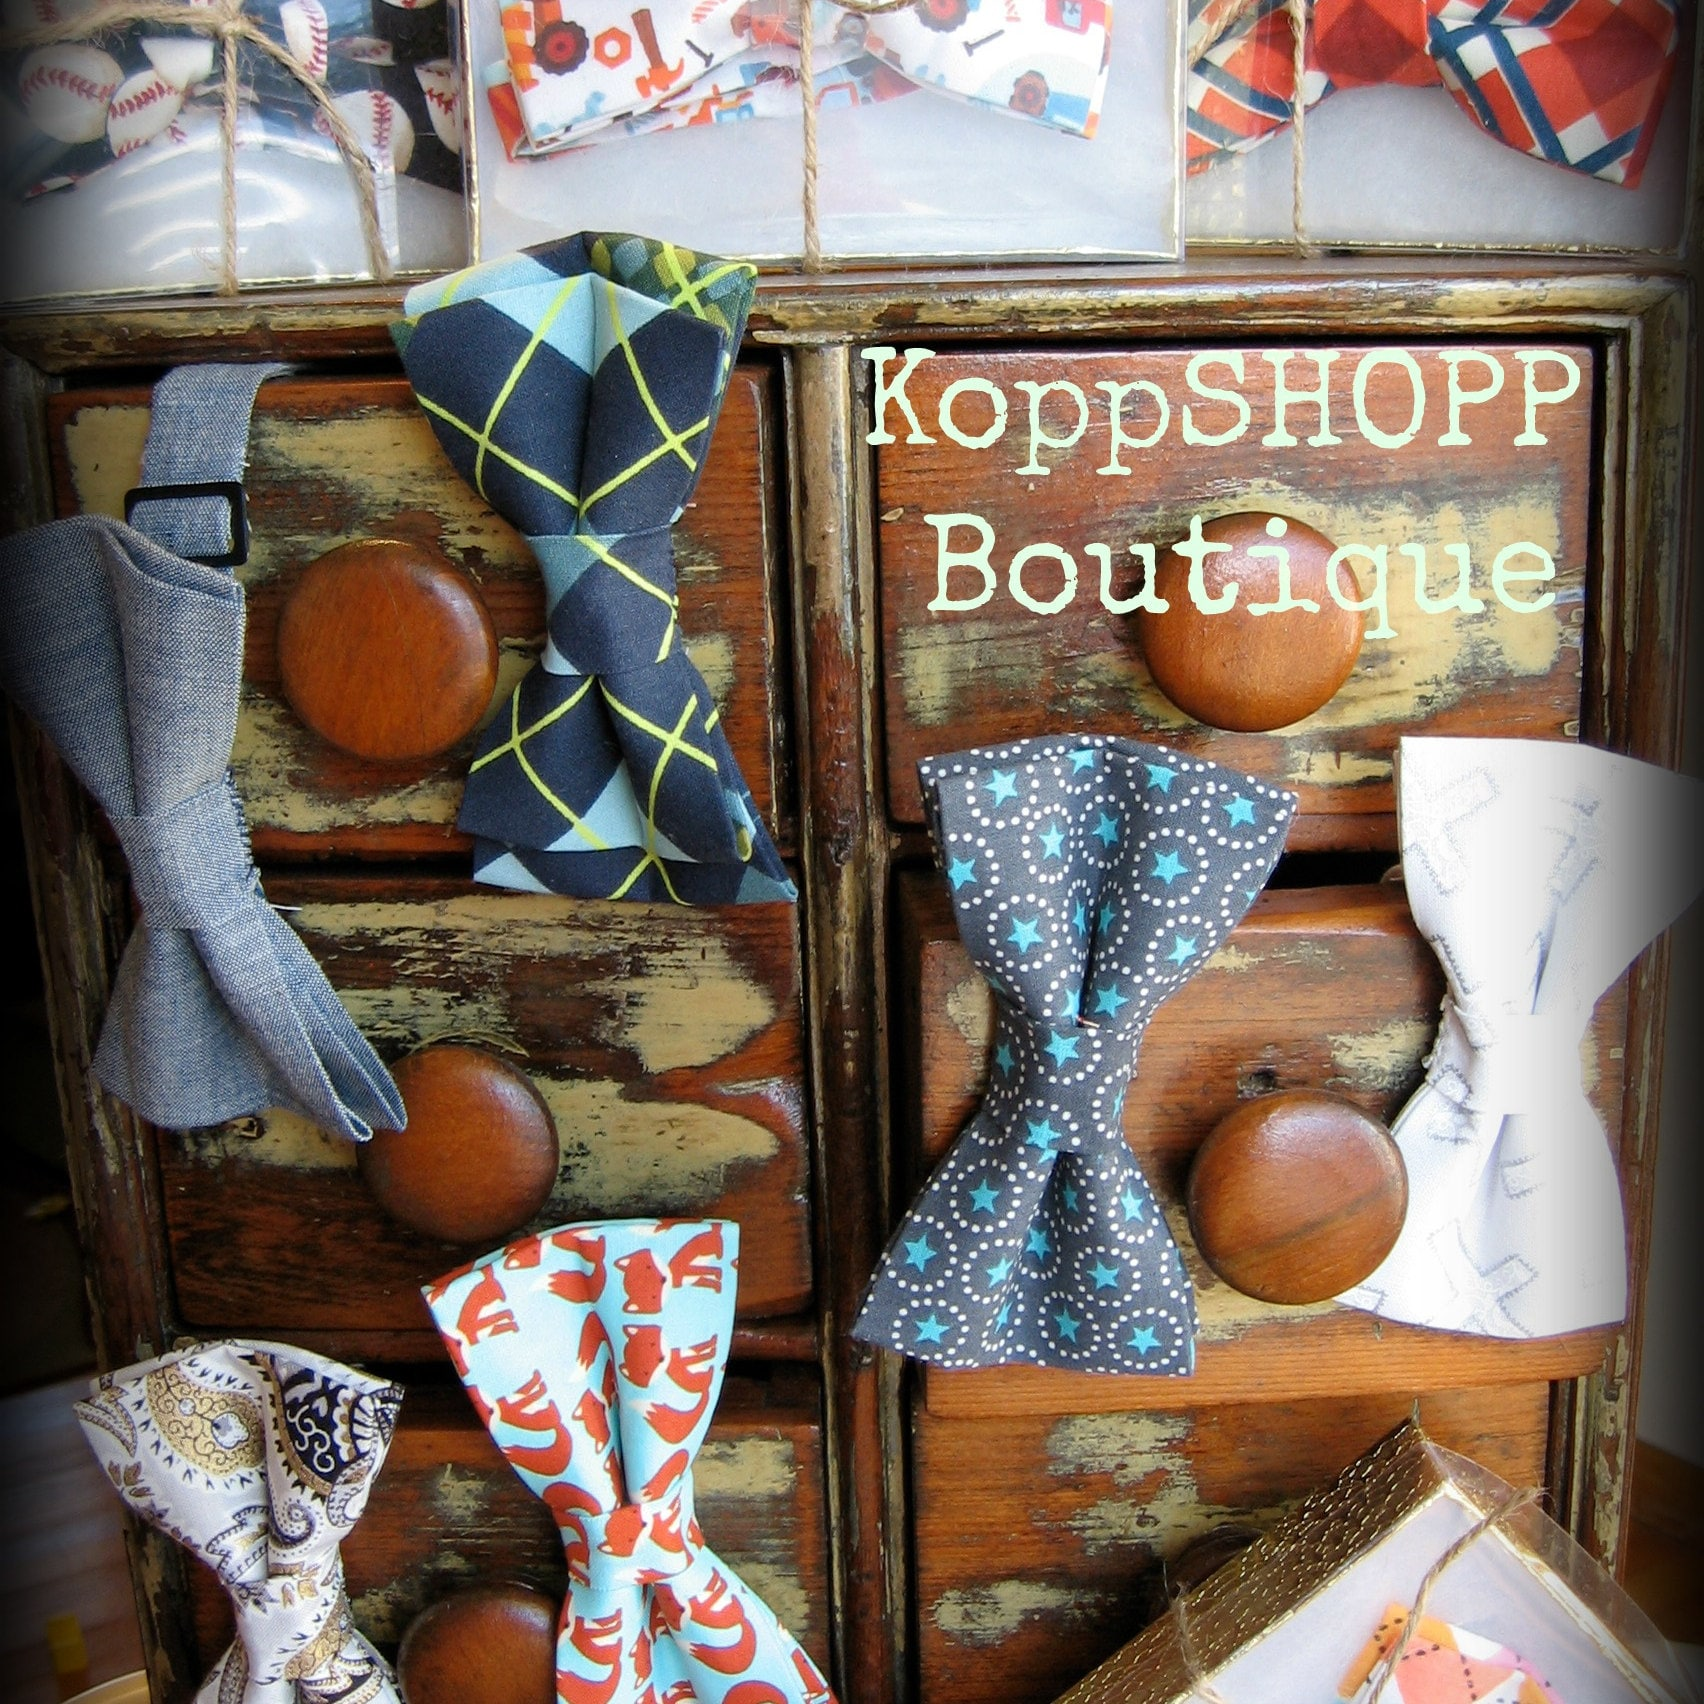 KoppSHOPP Boutique von KoppSHOPP auf Etsy